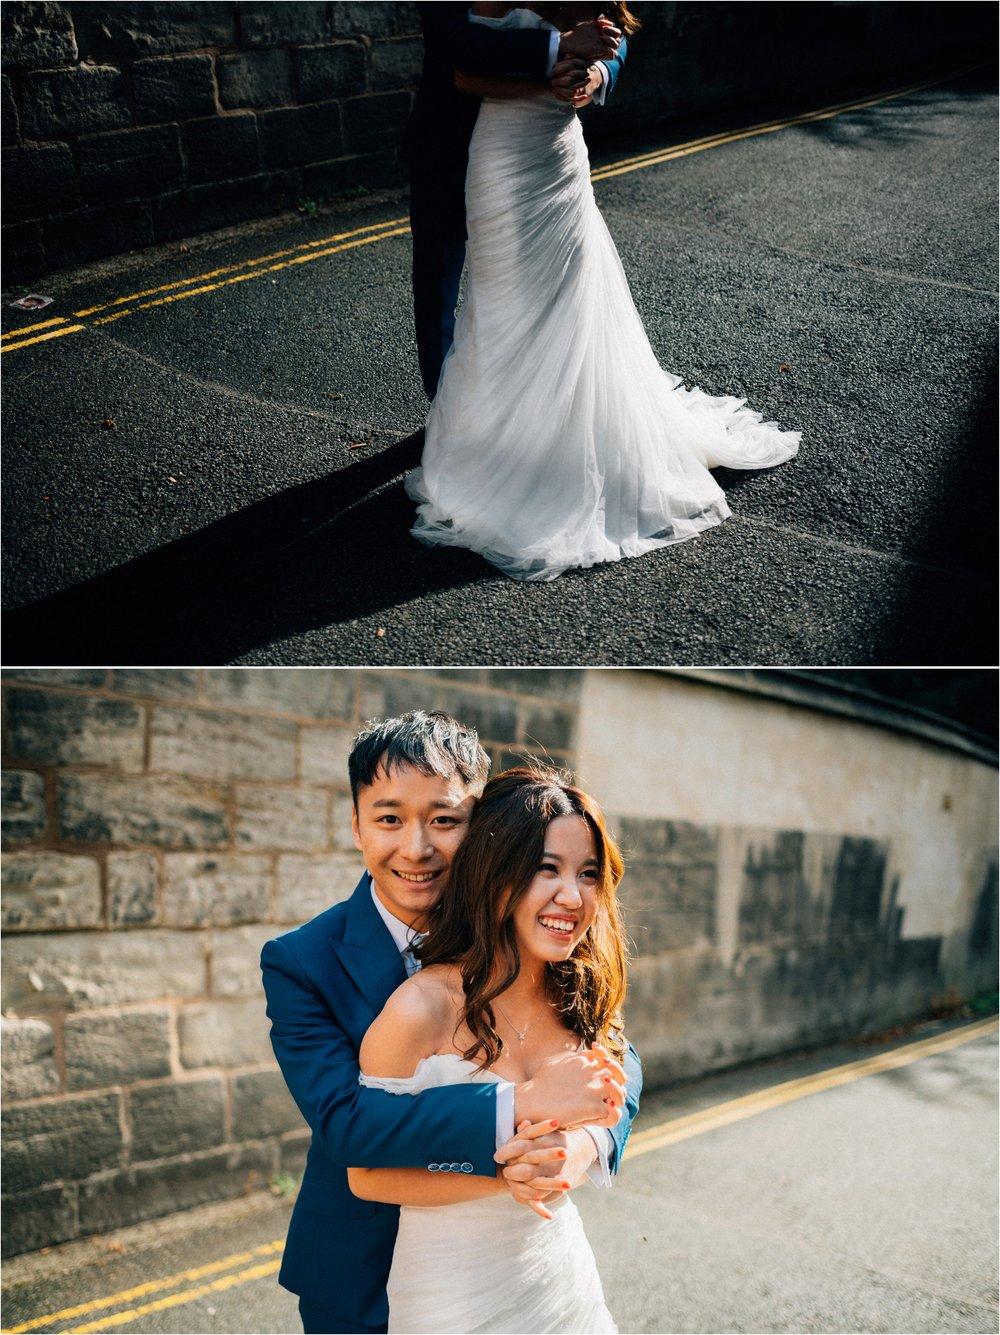 York city elopement wedding photographer_0077.jpg